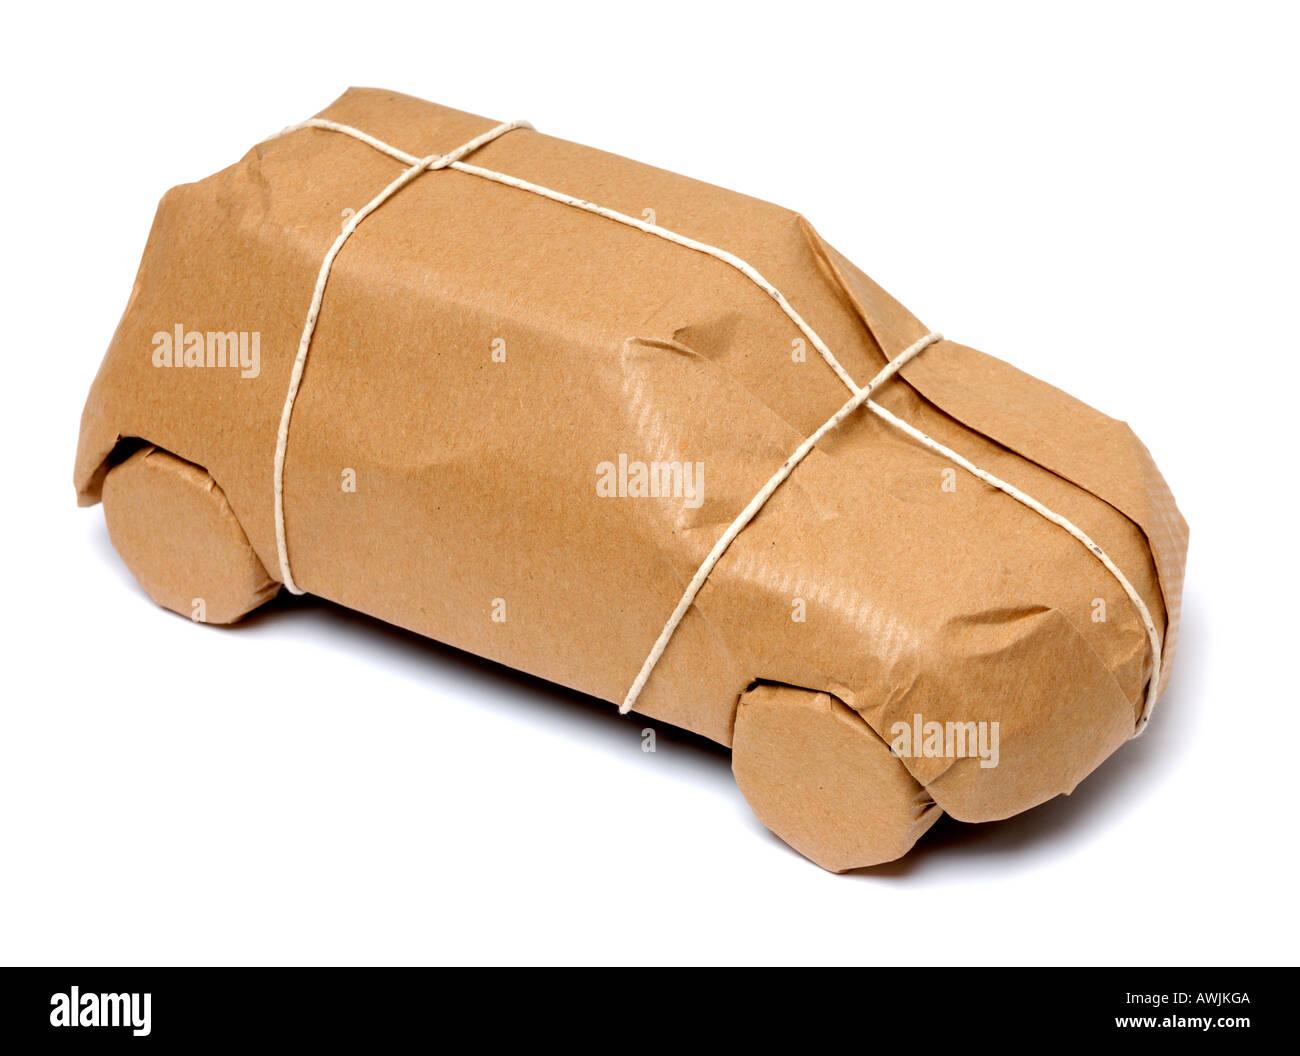 Car shaped paper parcel - Stock Image